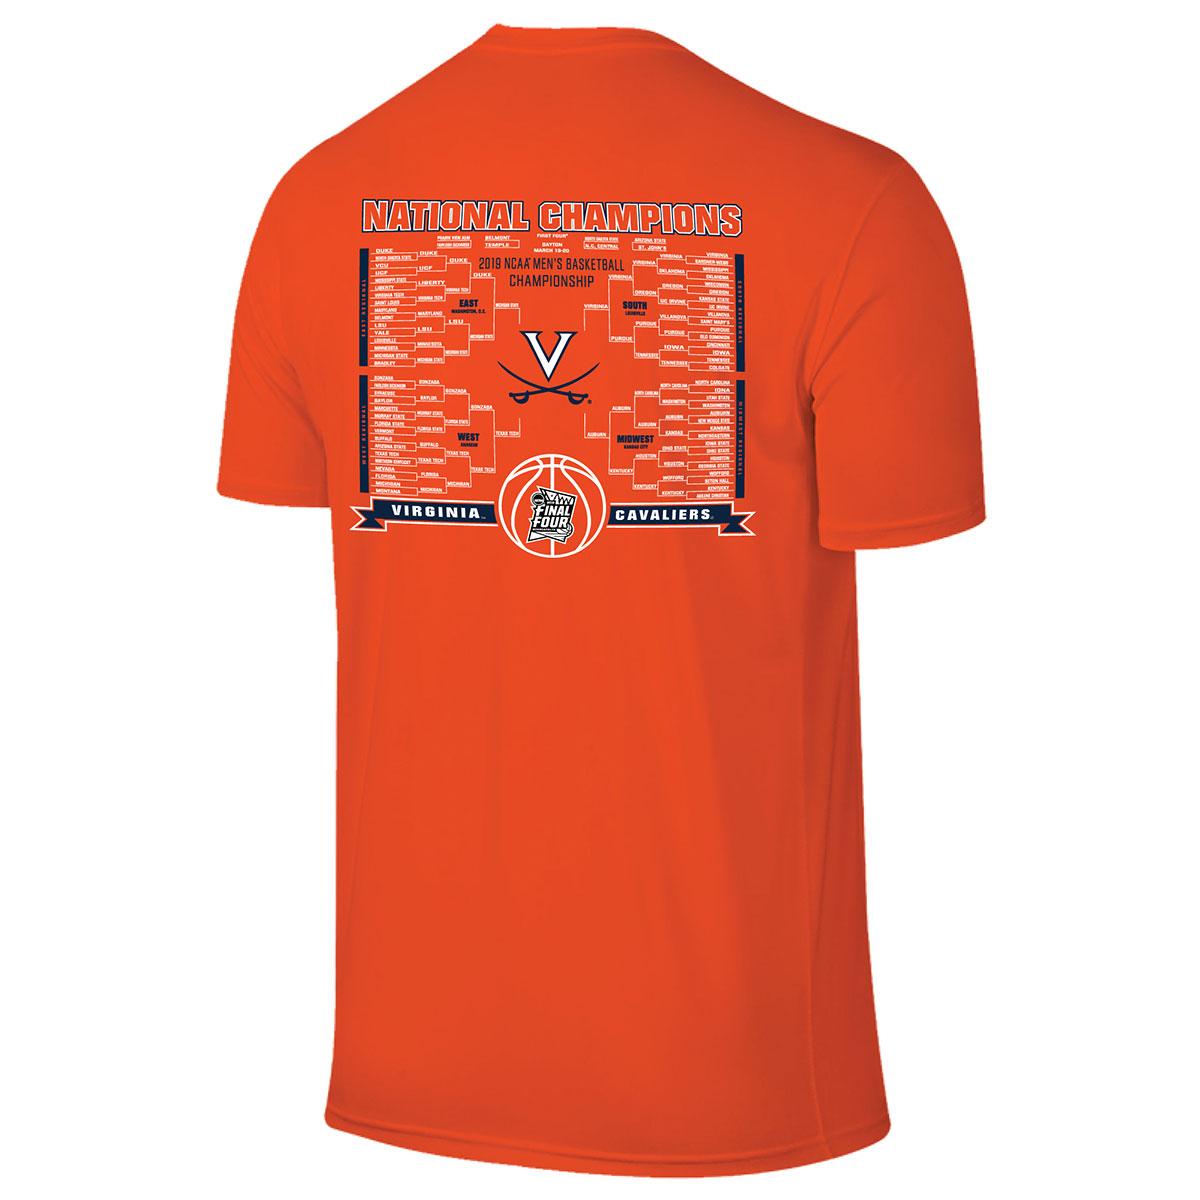 2019 National Champions Bracket T-shirt - Orange